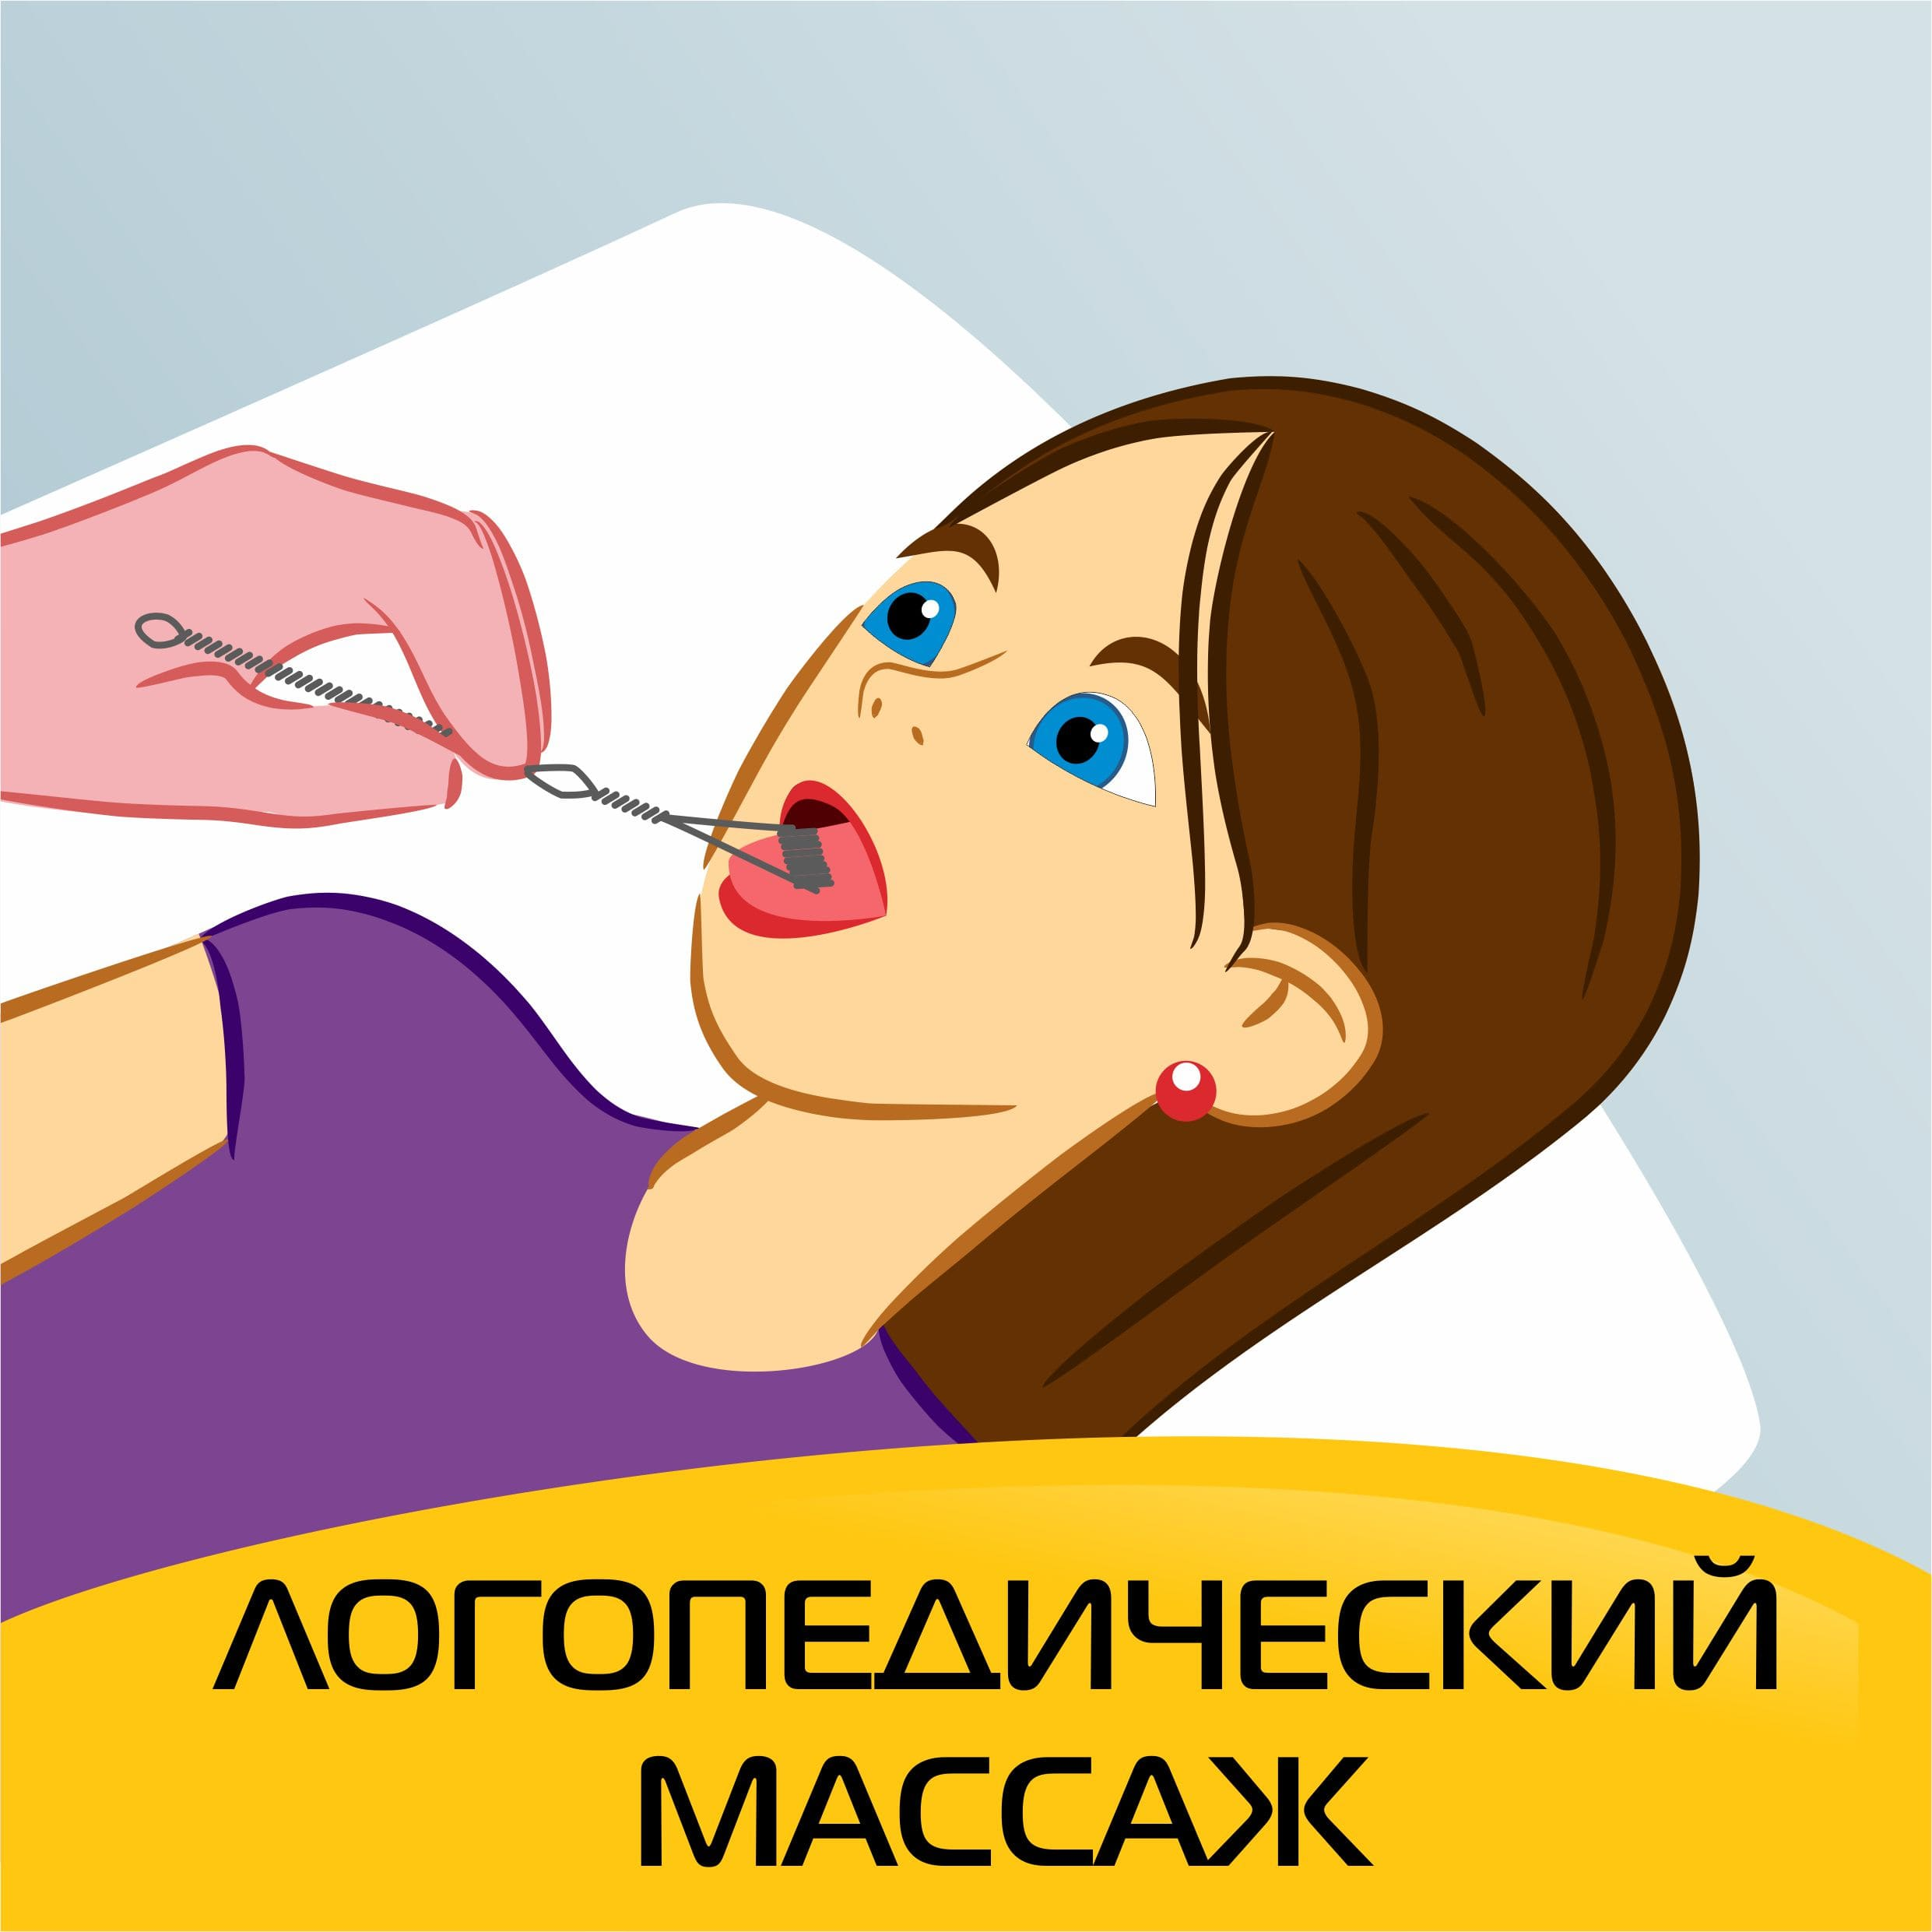 Логопедичесий массаж